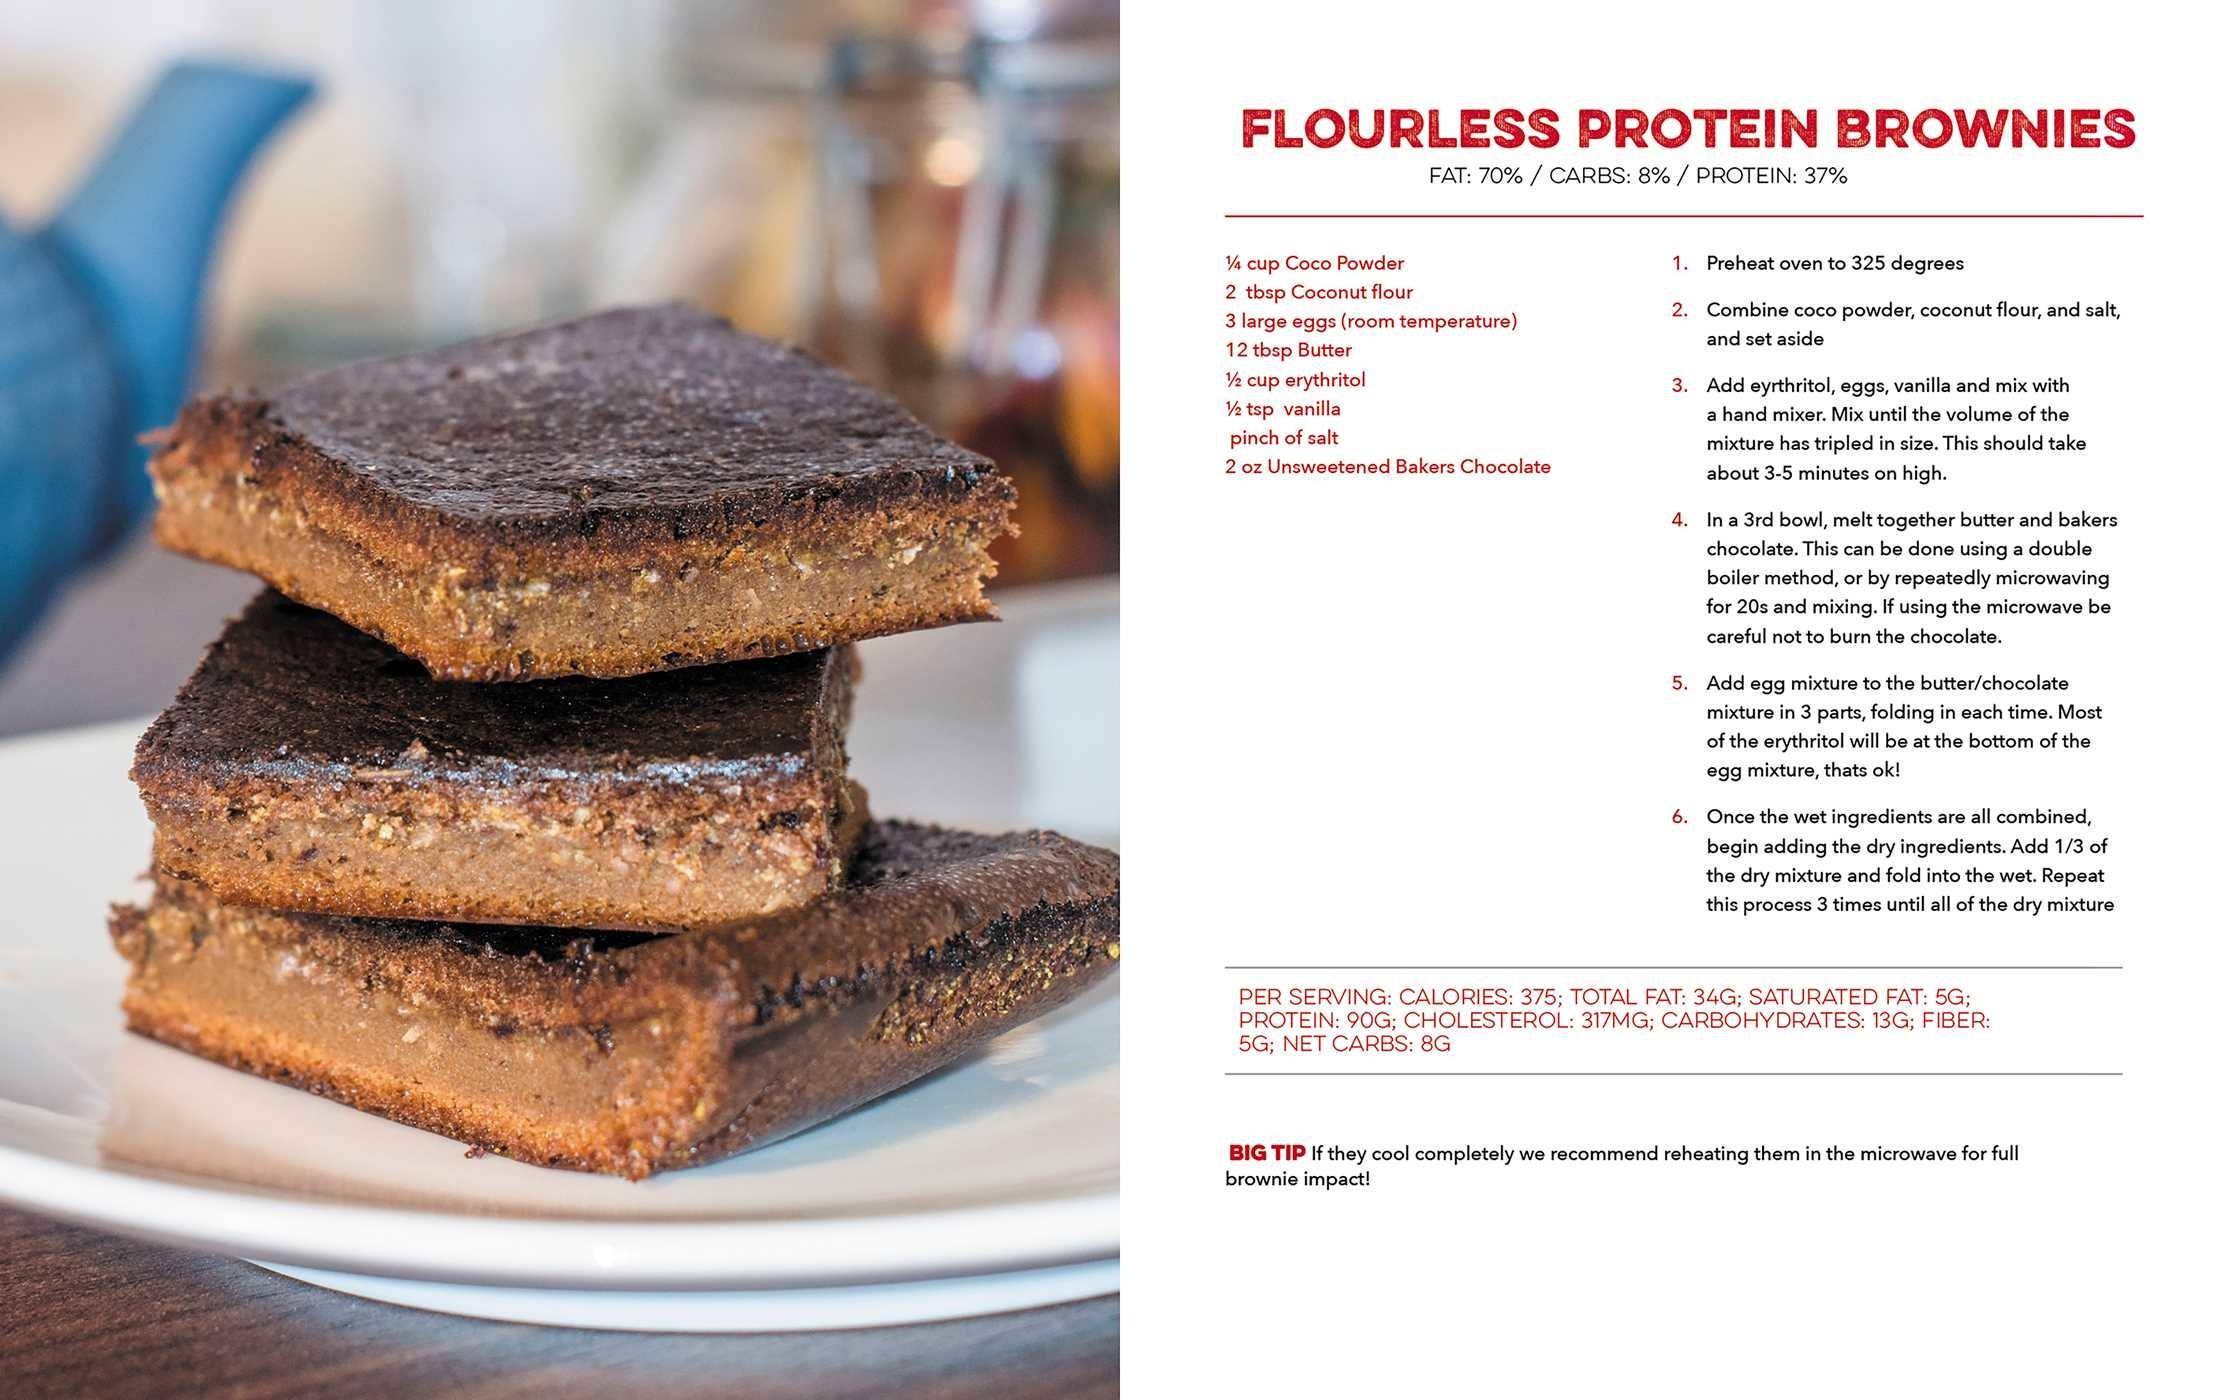 The ketogenic diet cookbook 9781604337945.in04